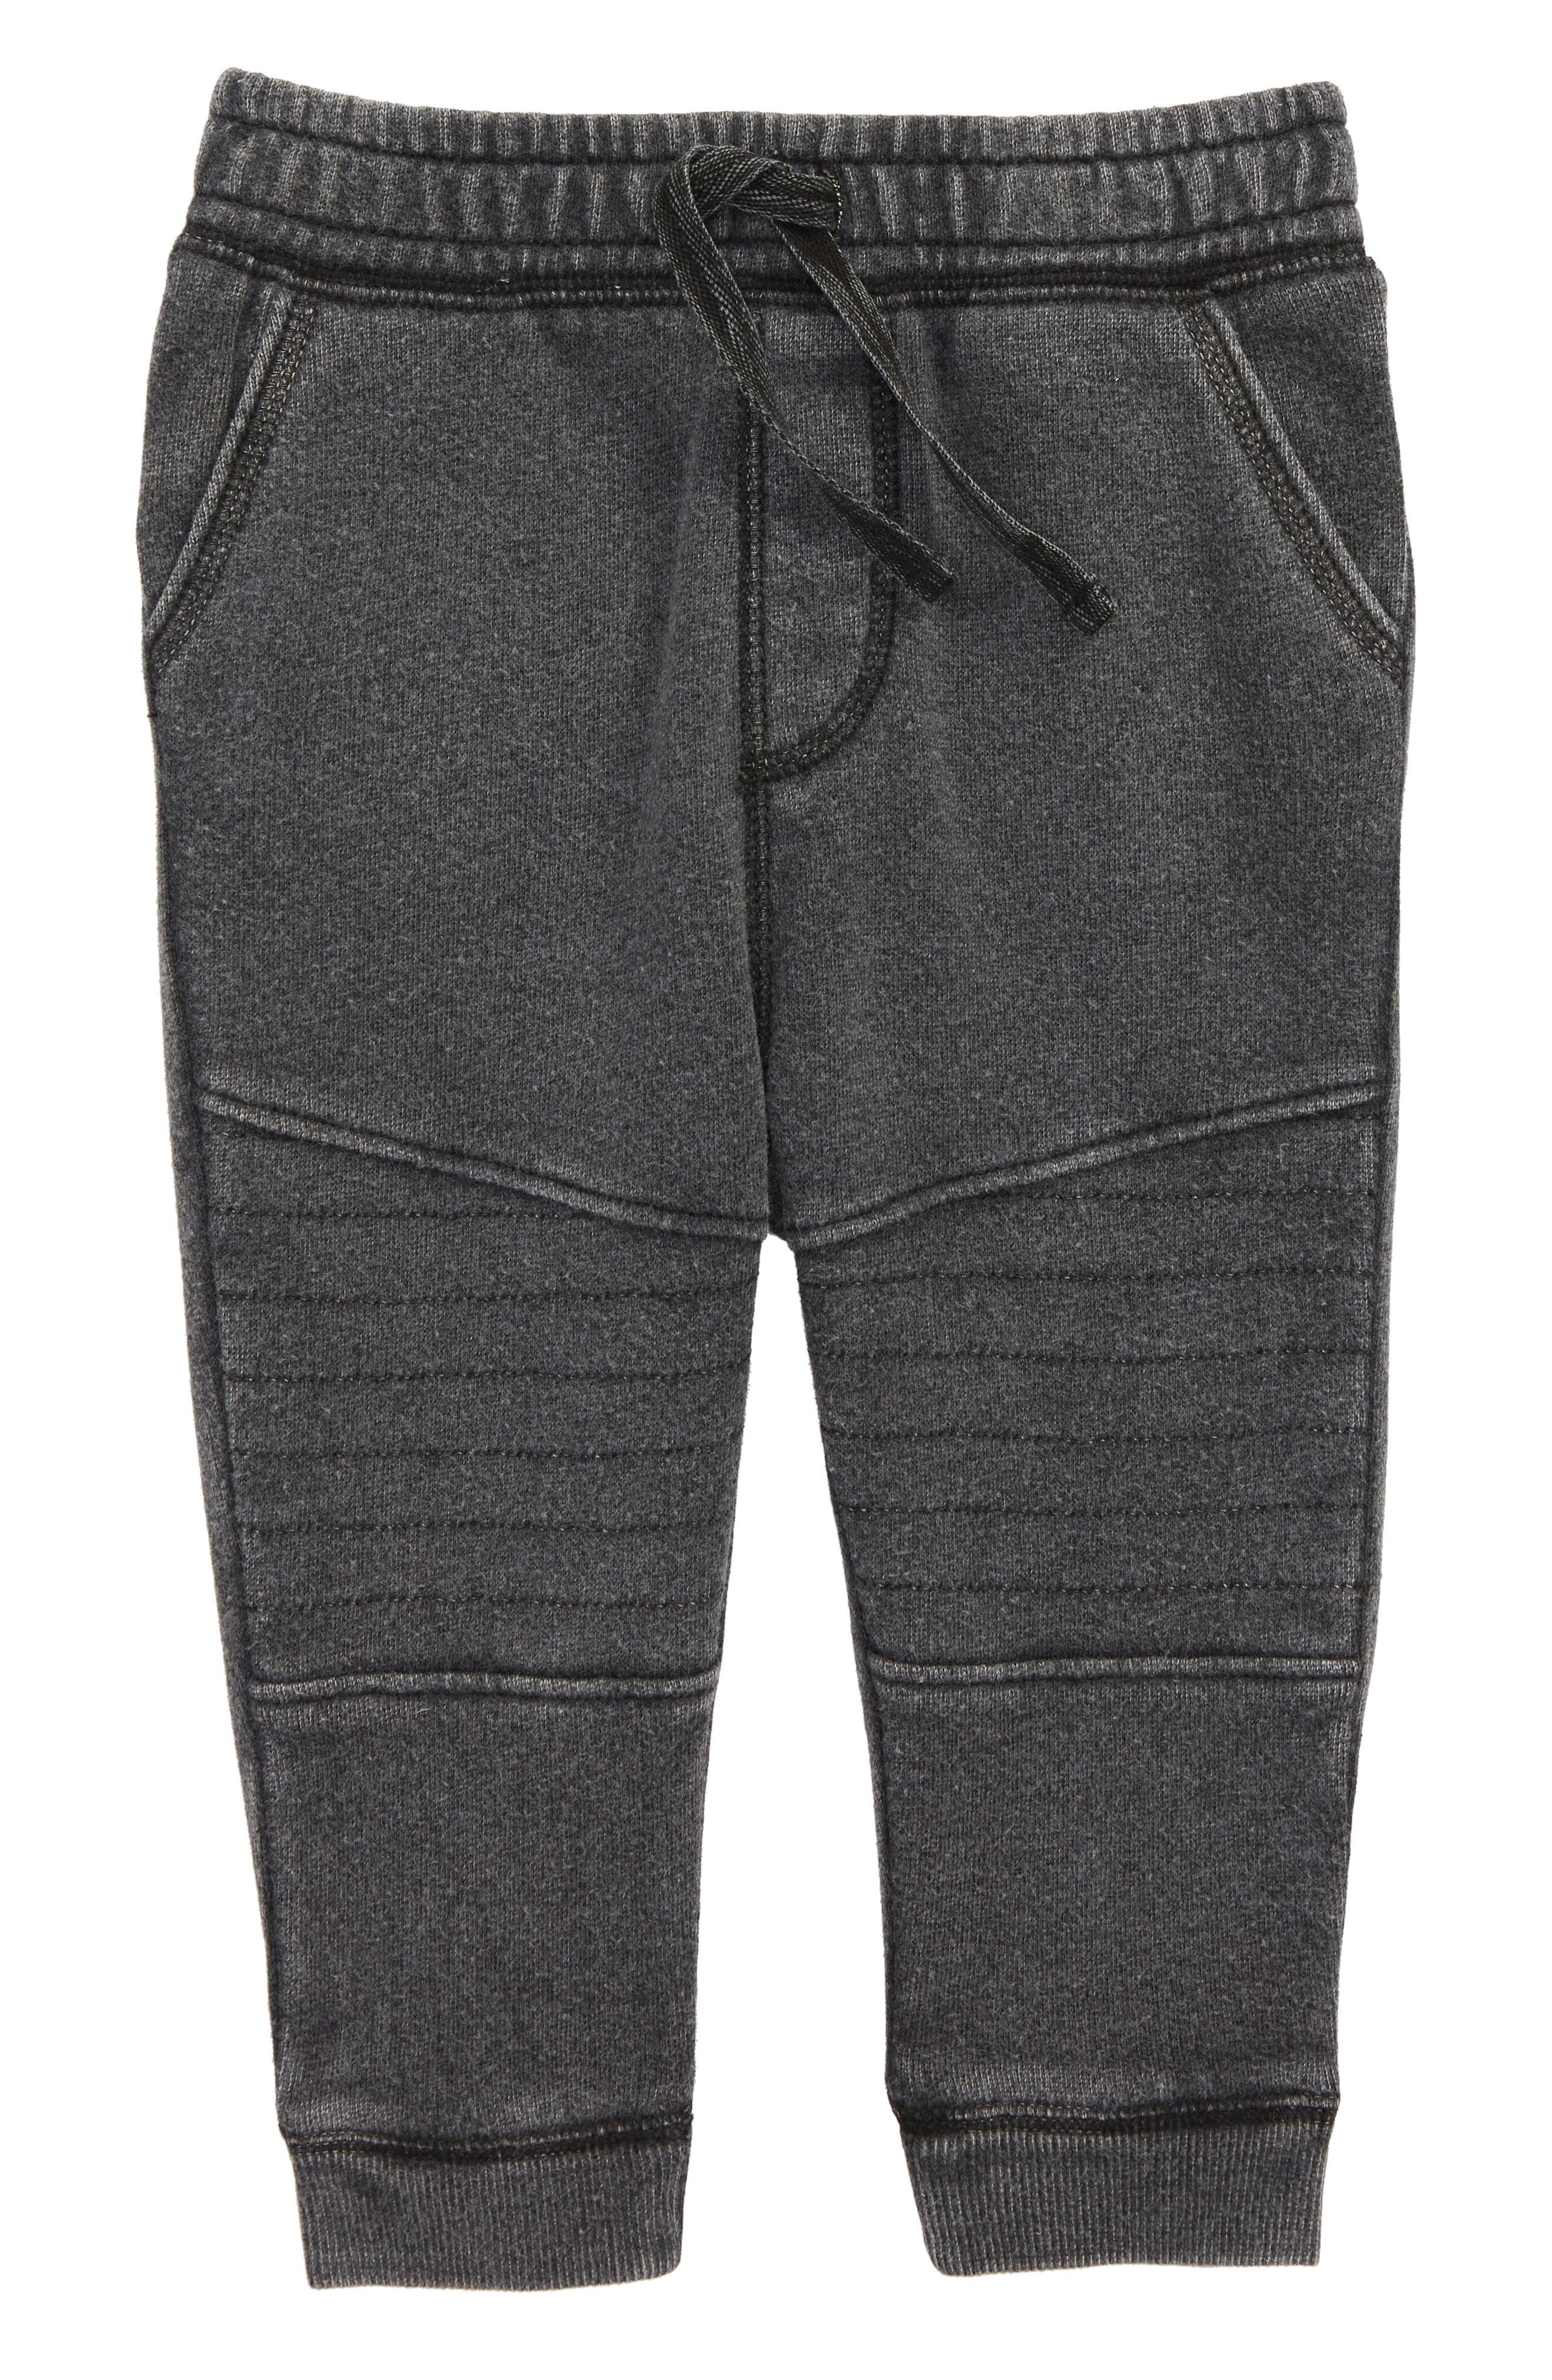 Moto Jogger Pants,                         Main,                         color, Black